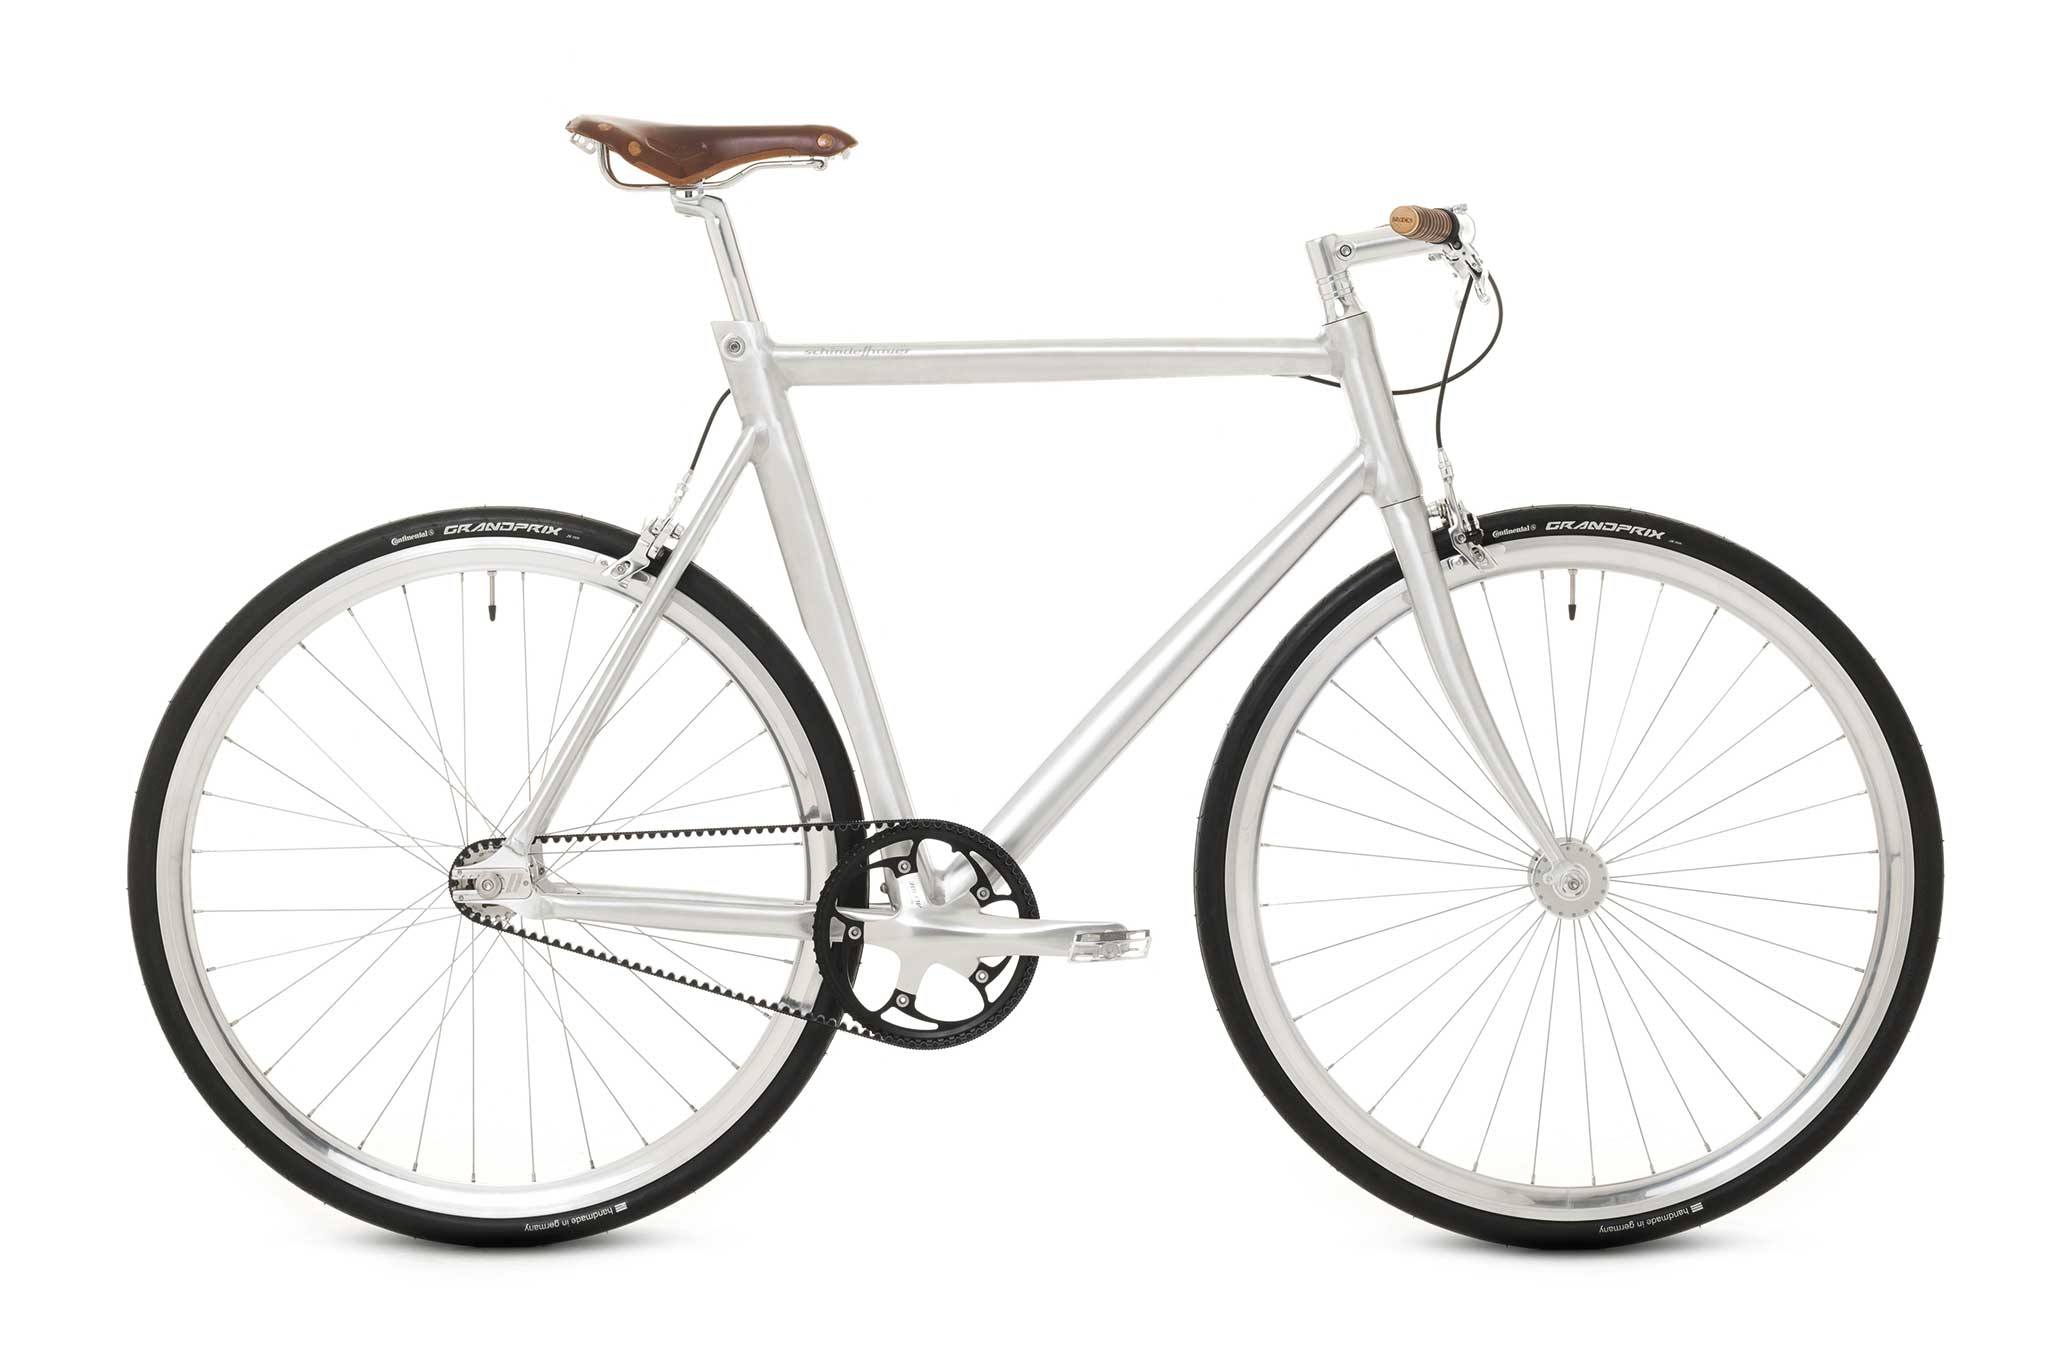 Schindelhauer, fabricant de vélos urbain à courroie